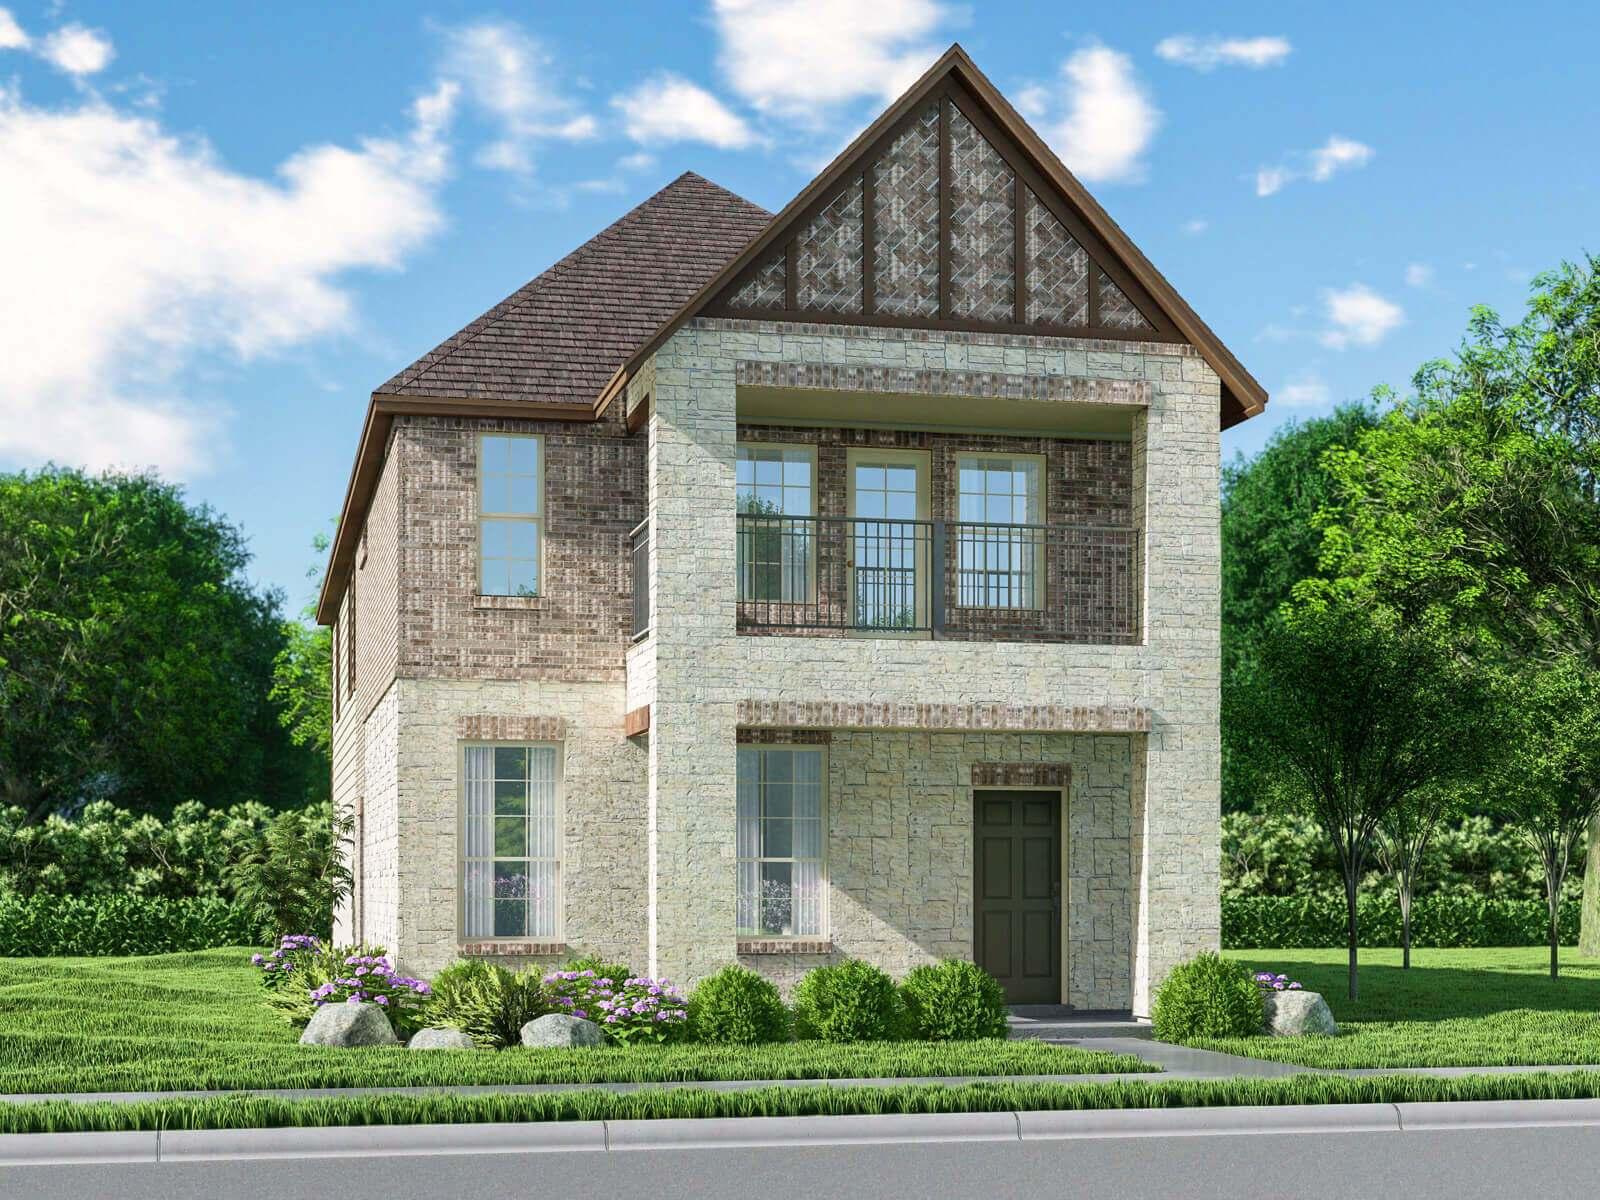 http://partners-dynamic.bdxcdn.com/Images/Homes/MeritageHom/max1500_32193059-190207.jpg